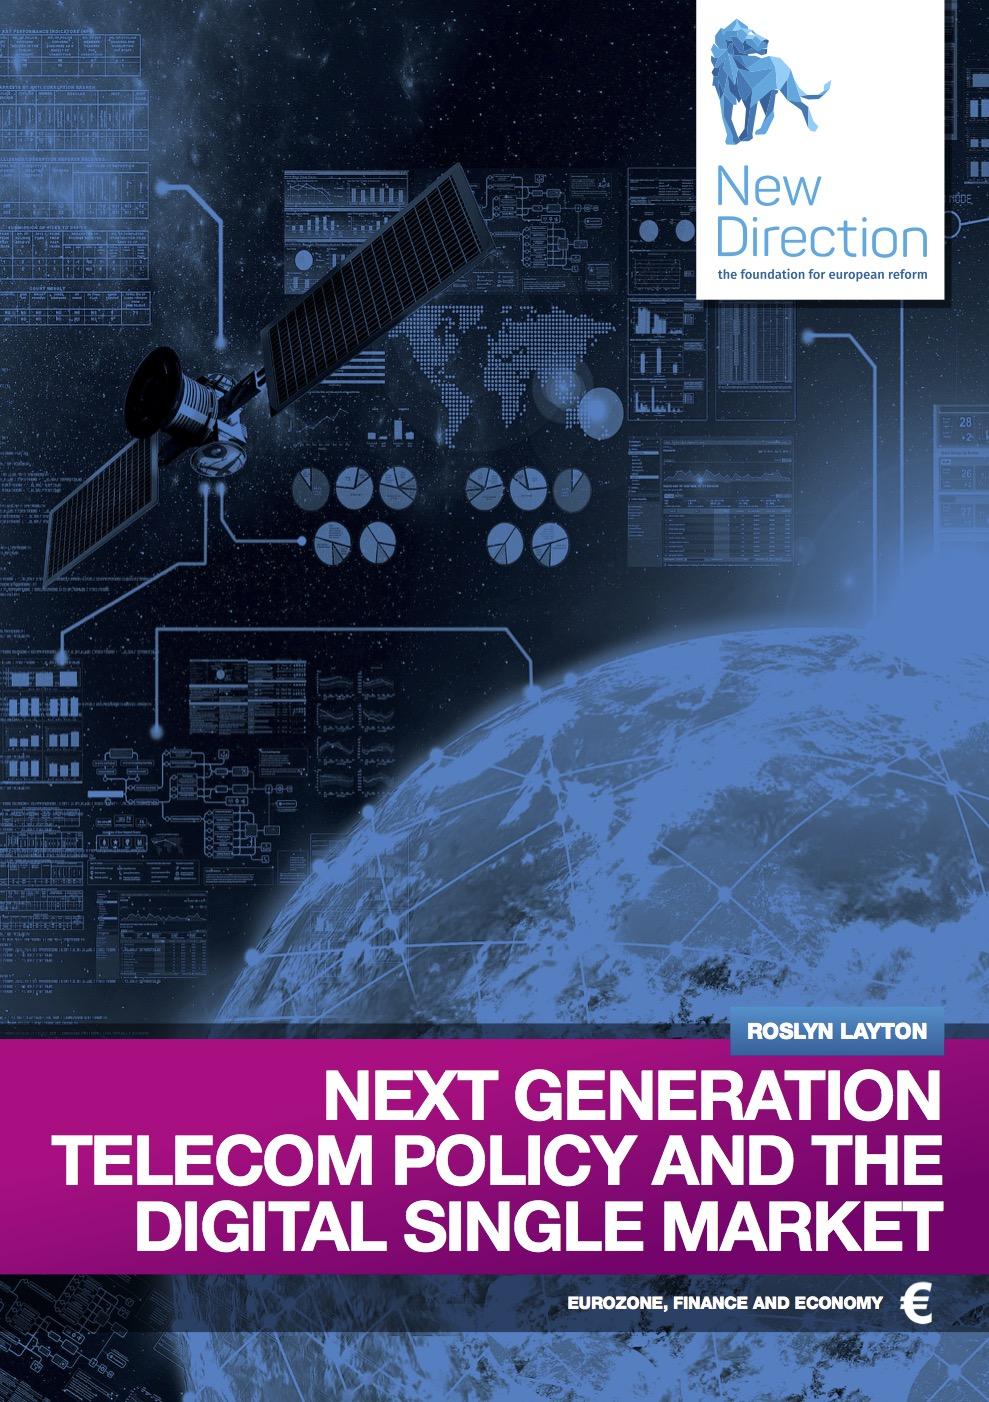 Next generation telecom policy and the Digital Single Market